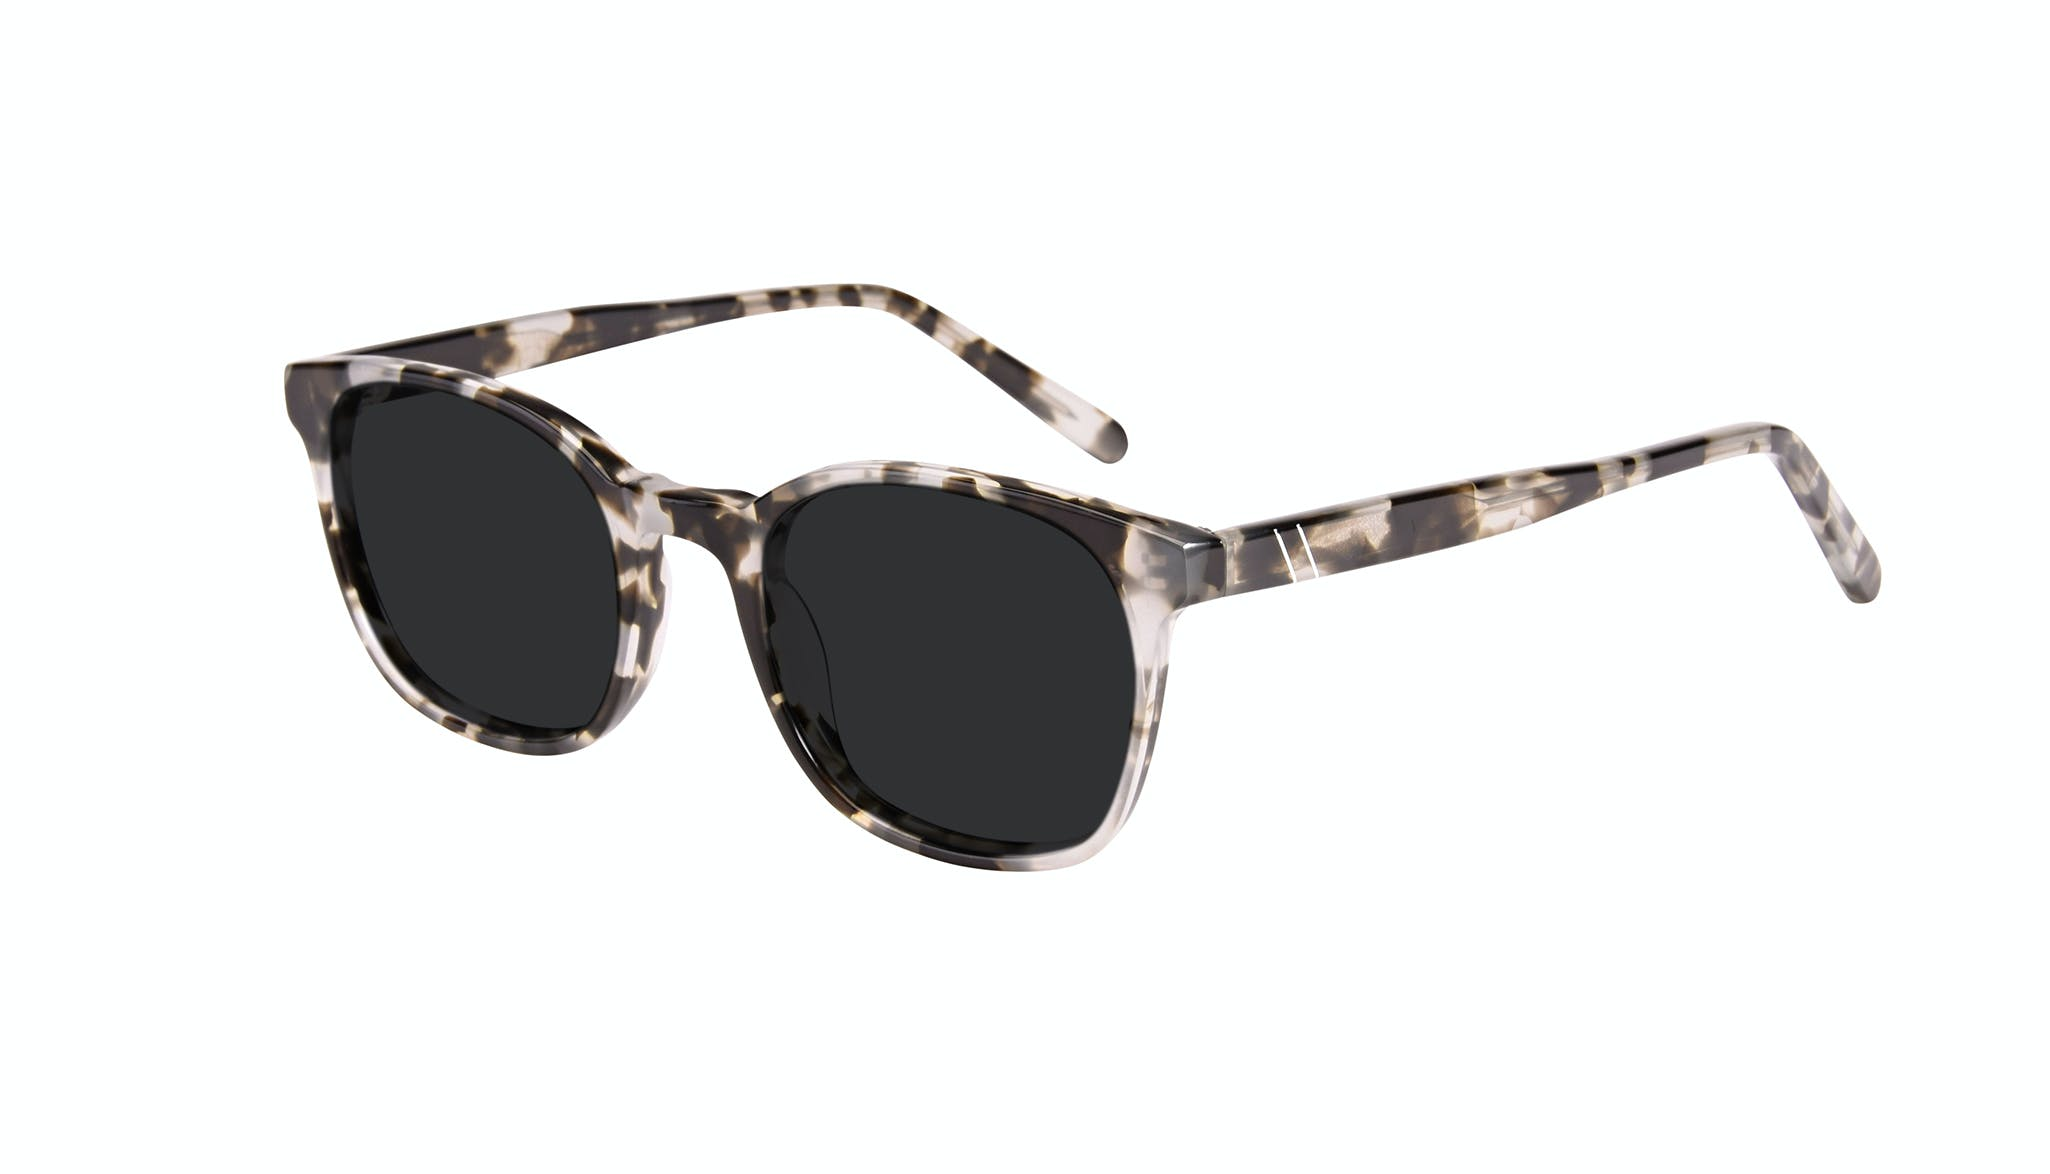 Affordable Fashion Glasses Rectangle Square Sunglasses Men Peak Camo Tort Tilt